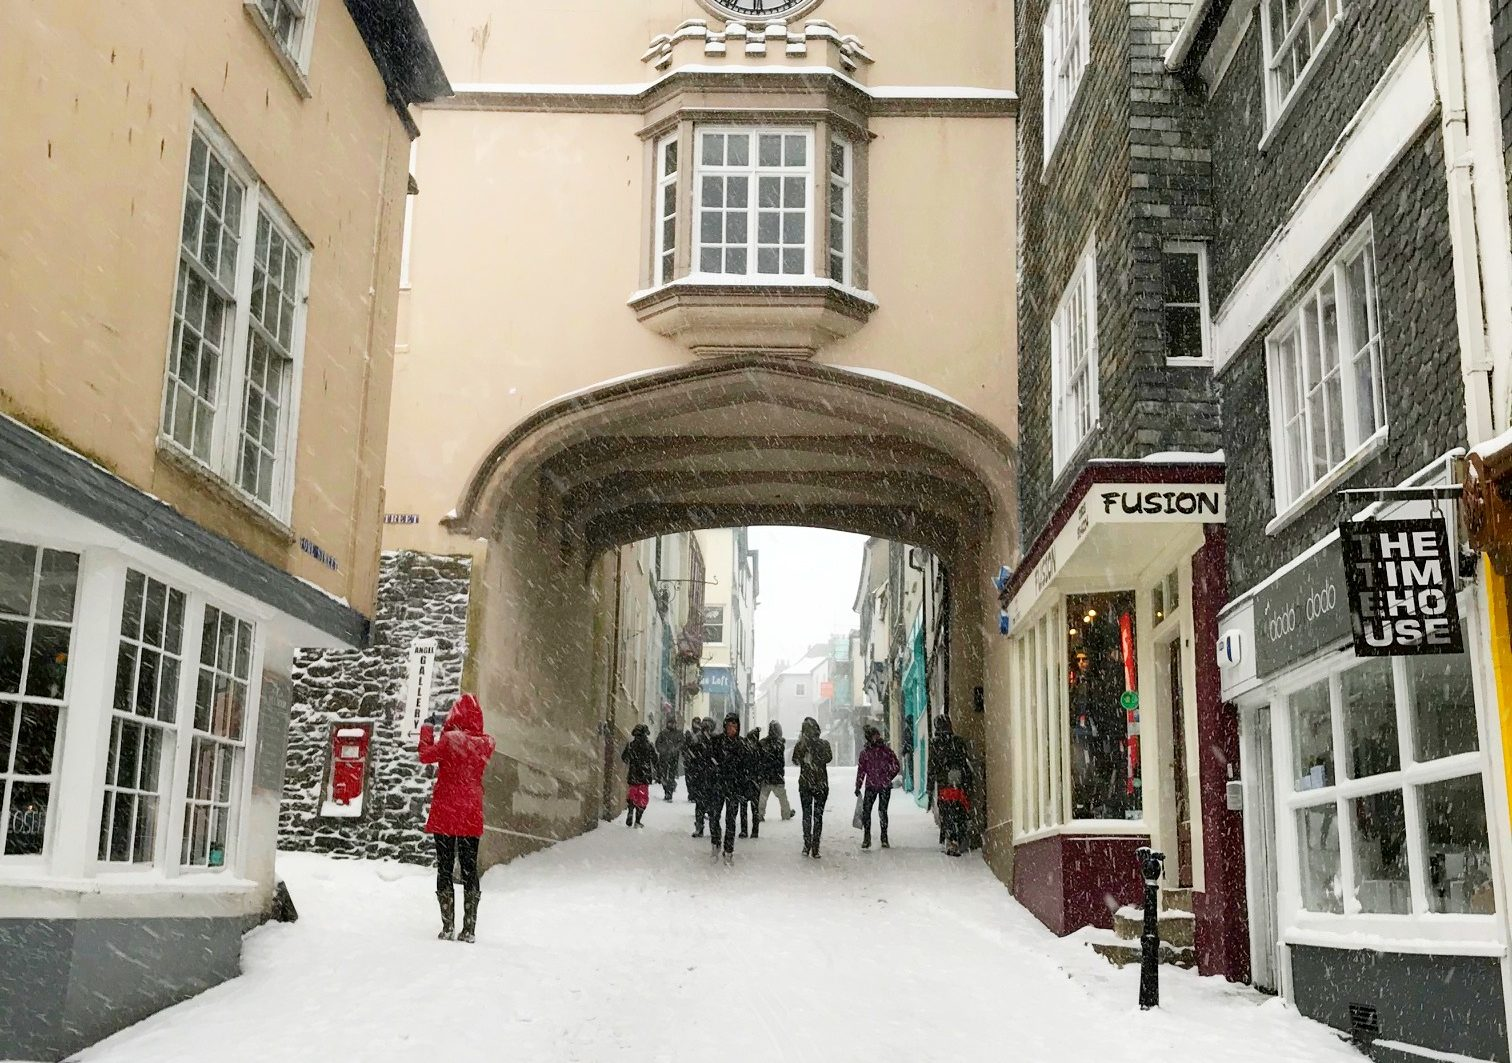 totnes snow scene at christmas